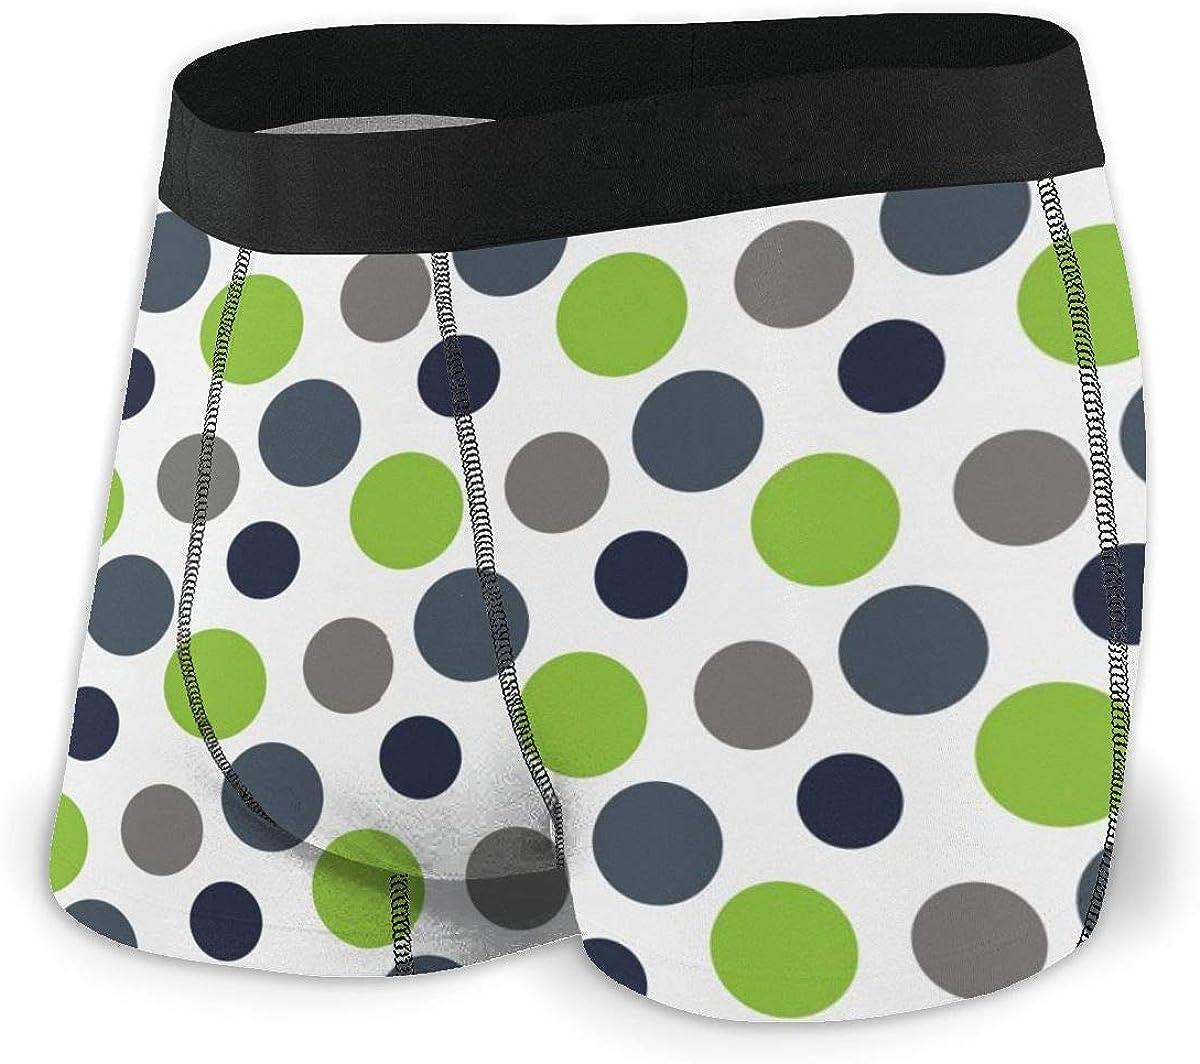 Rhodar Mens Breathable Soft Name Underwear Boxer Briefs